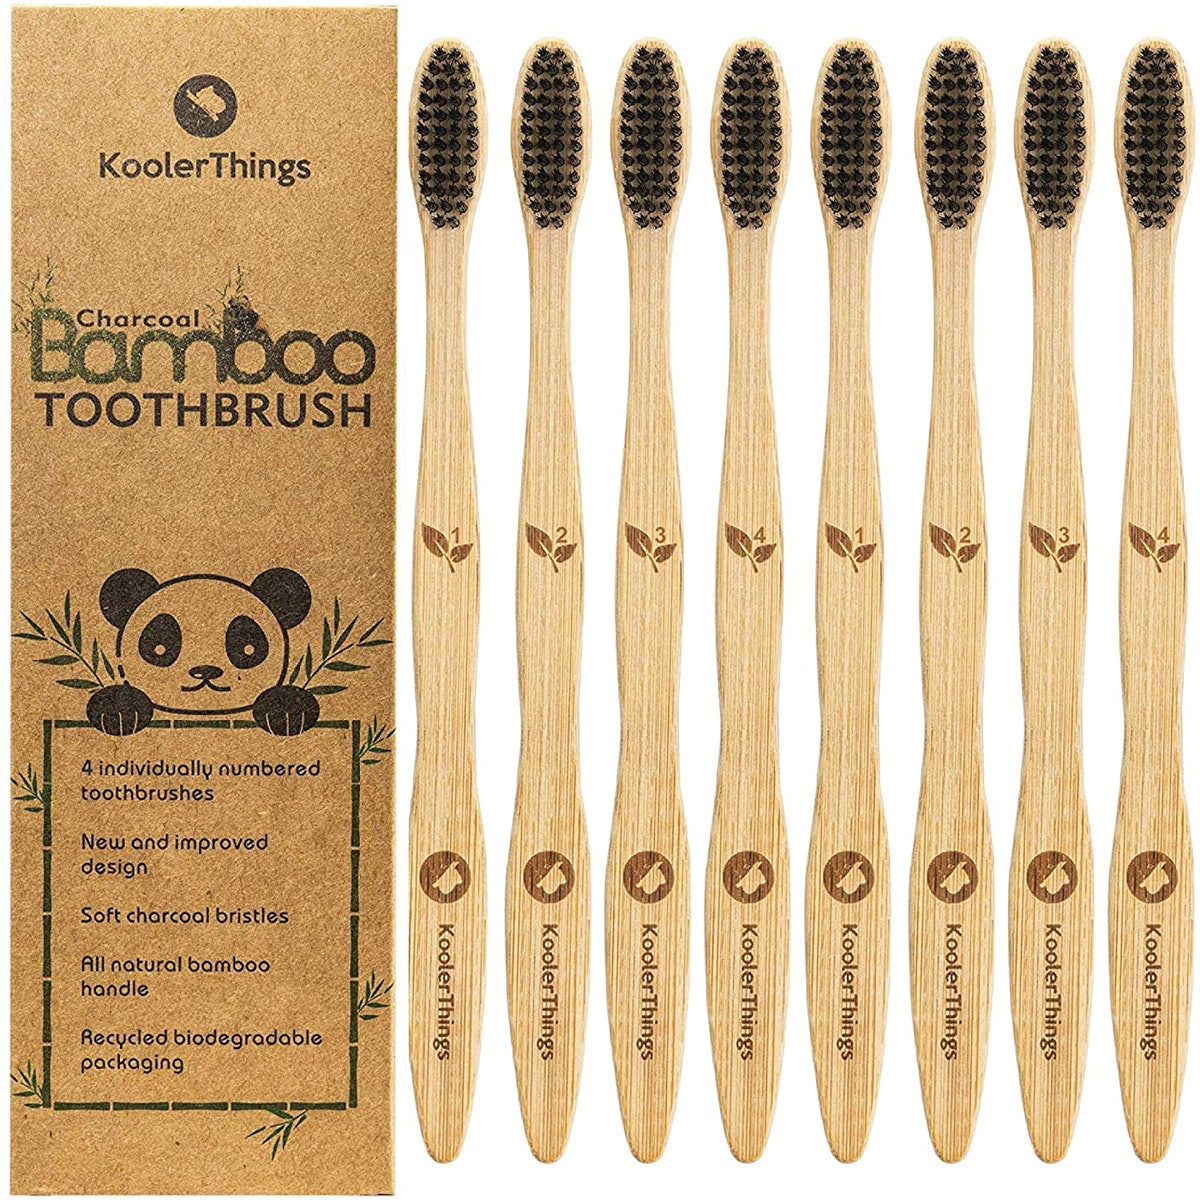 KoolerThings Charcoal Toothbrushes (8-Pack)